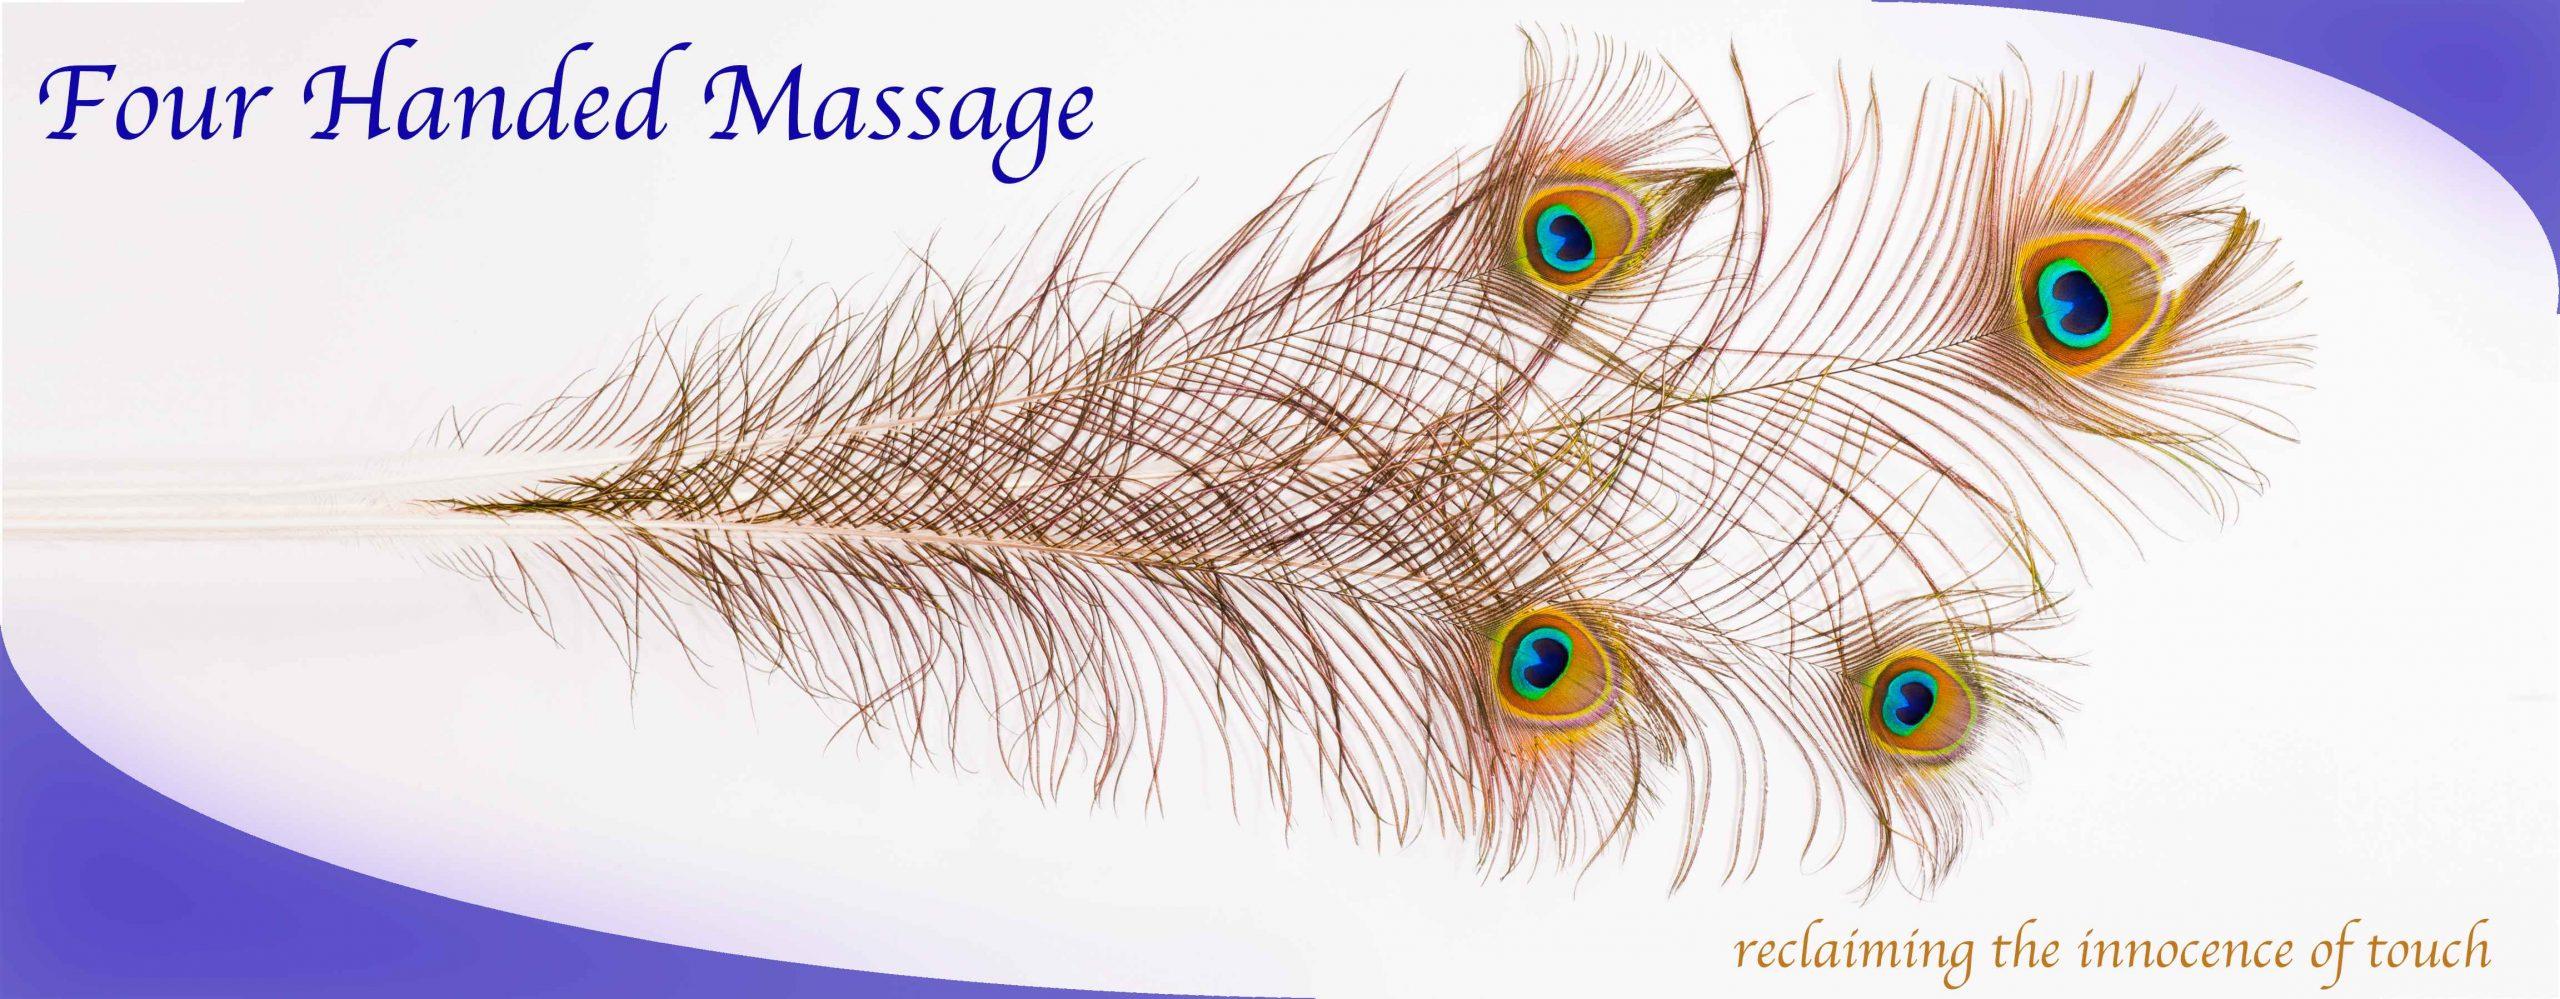 Four Handed Massage Banner